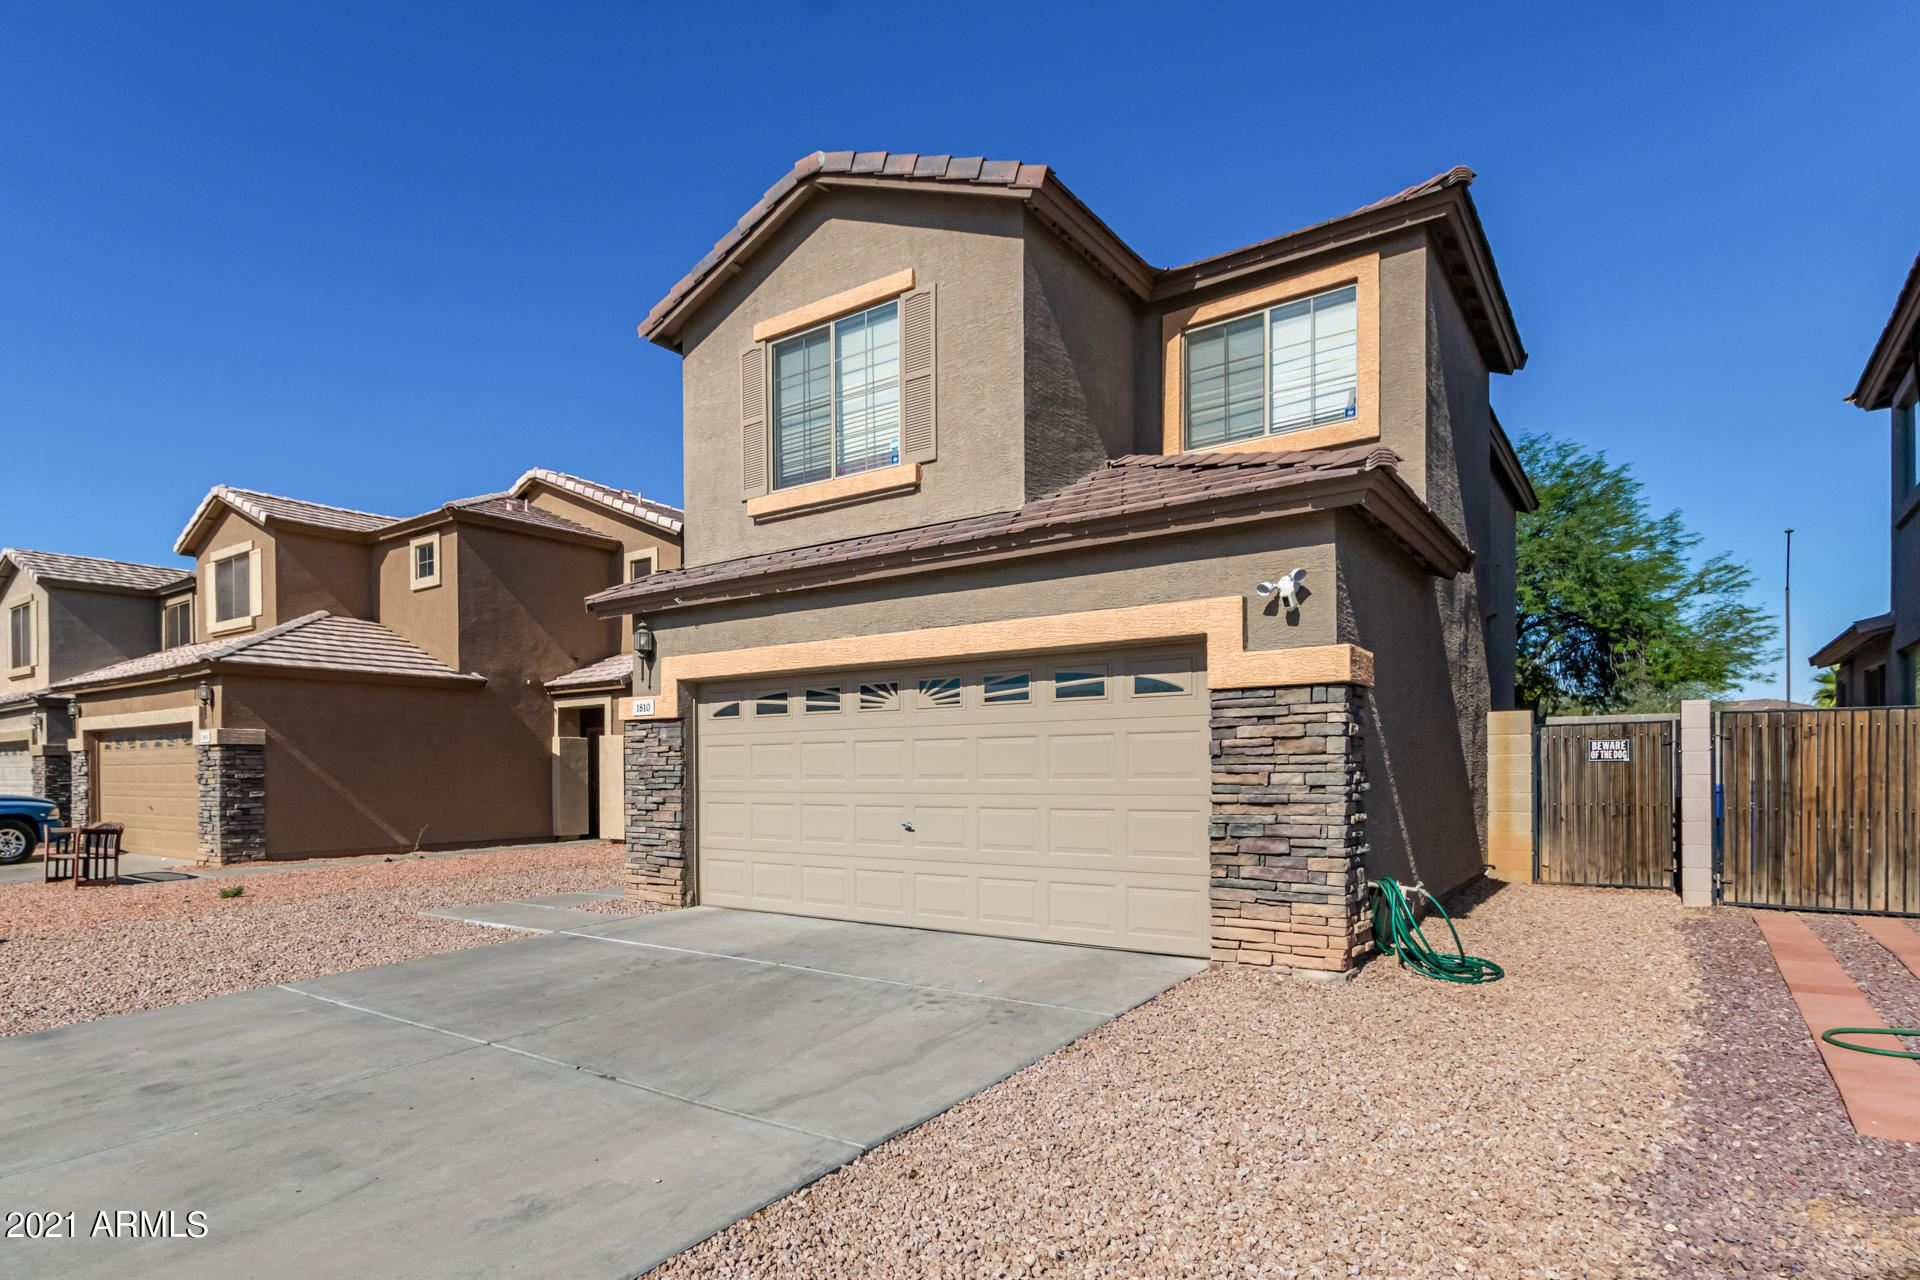 Photo of 1810 S 114TH Drive, Avondale, AZ 85323 (MLS # 6246437)